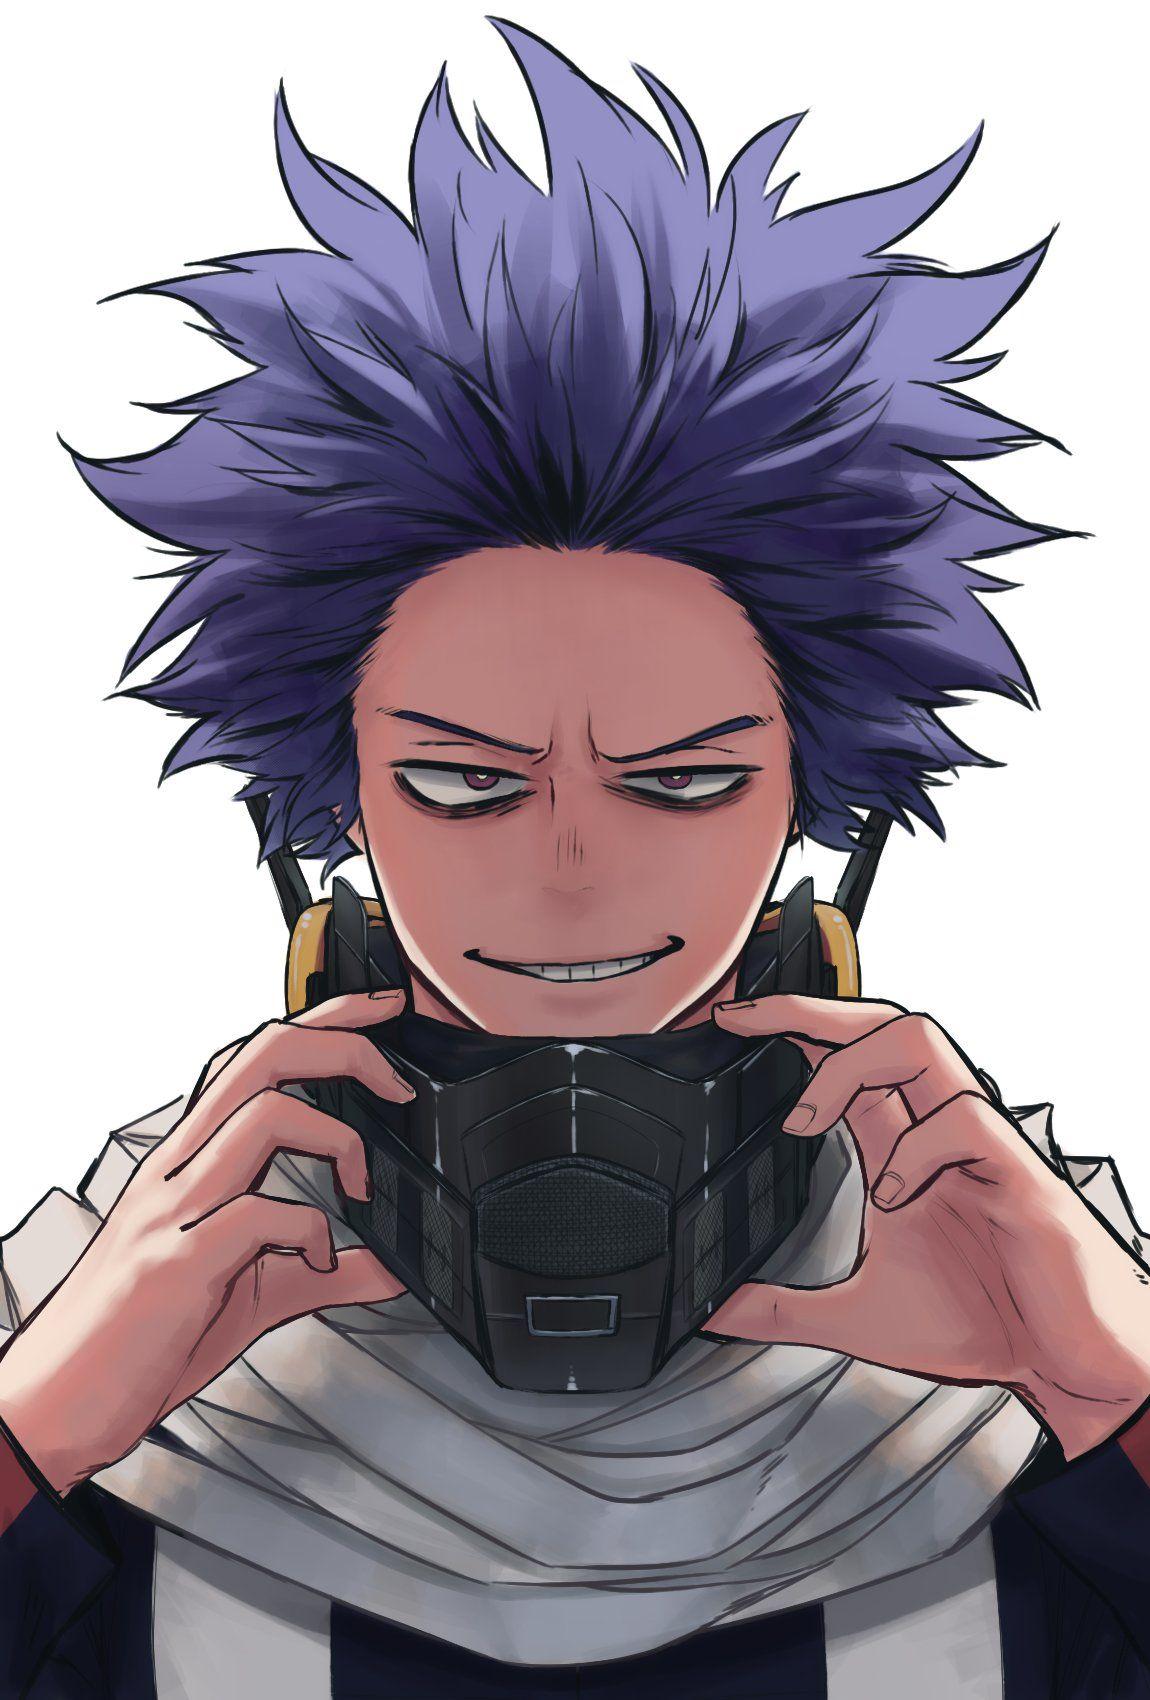 Kᴇɪɪᴅ On Twitter My Hero Boku No Hero Academia My Hero Academia